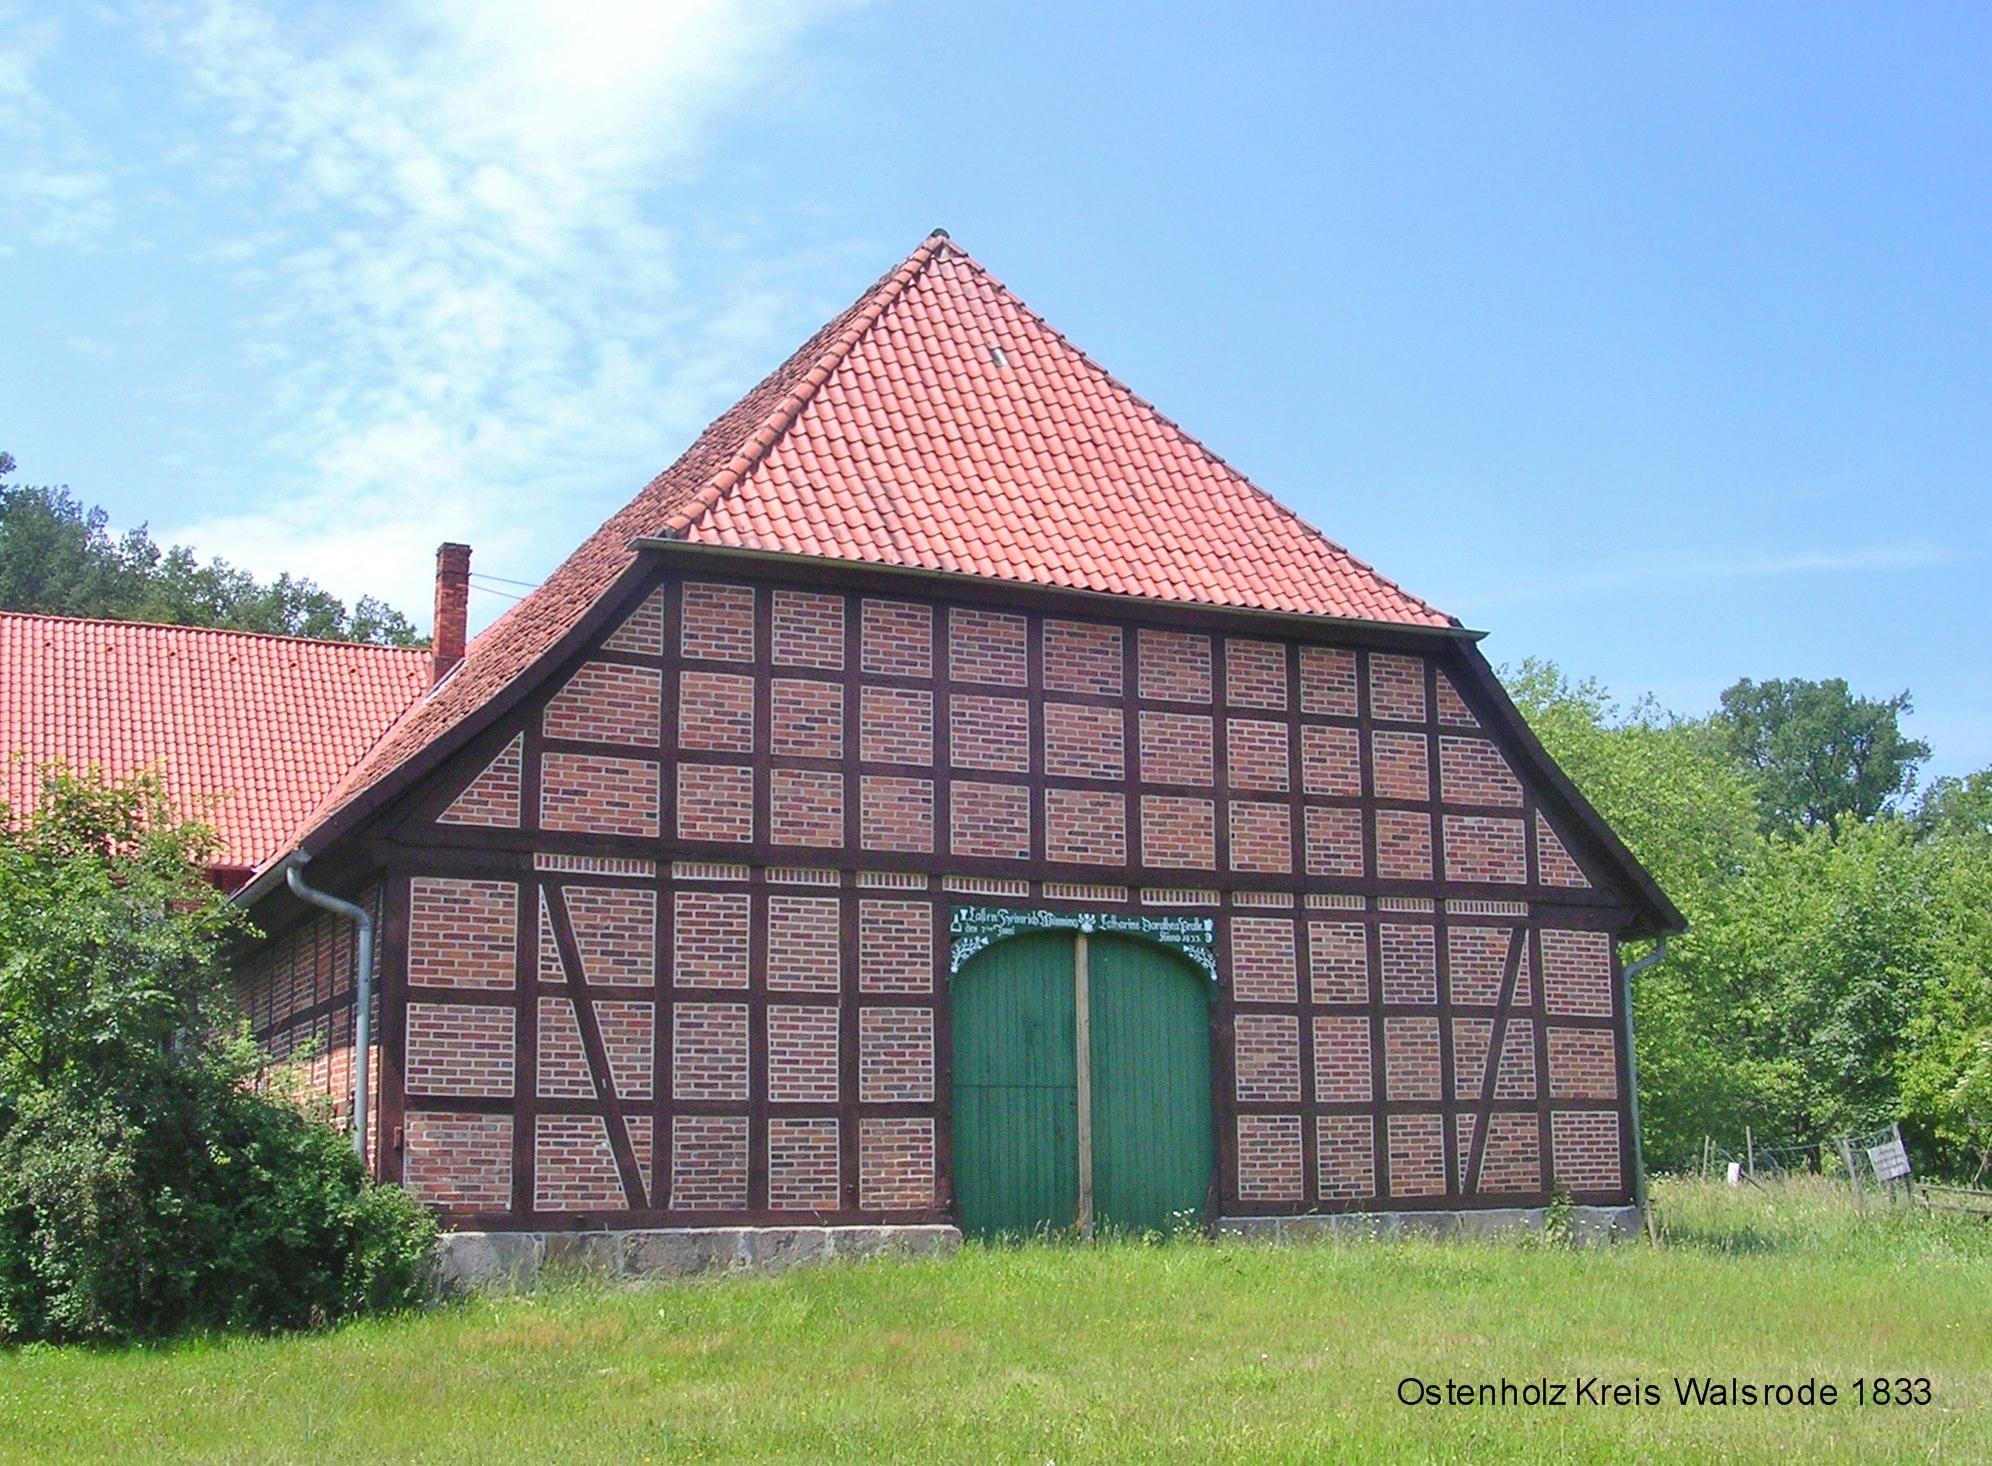 h-ostenholz-fal-1833-